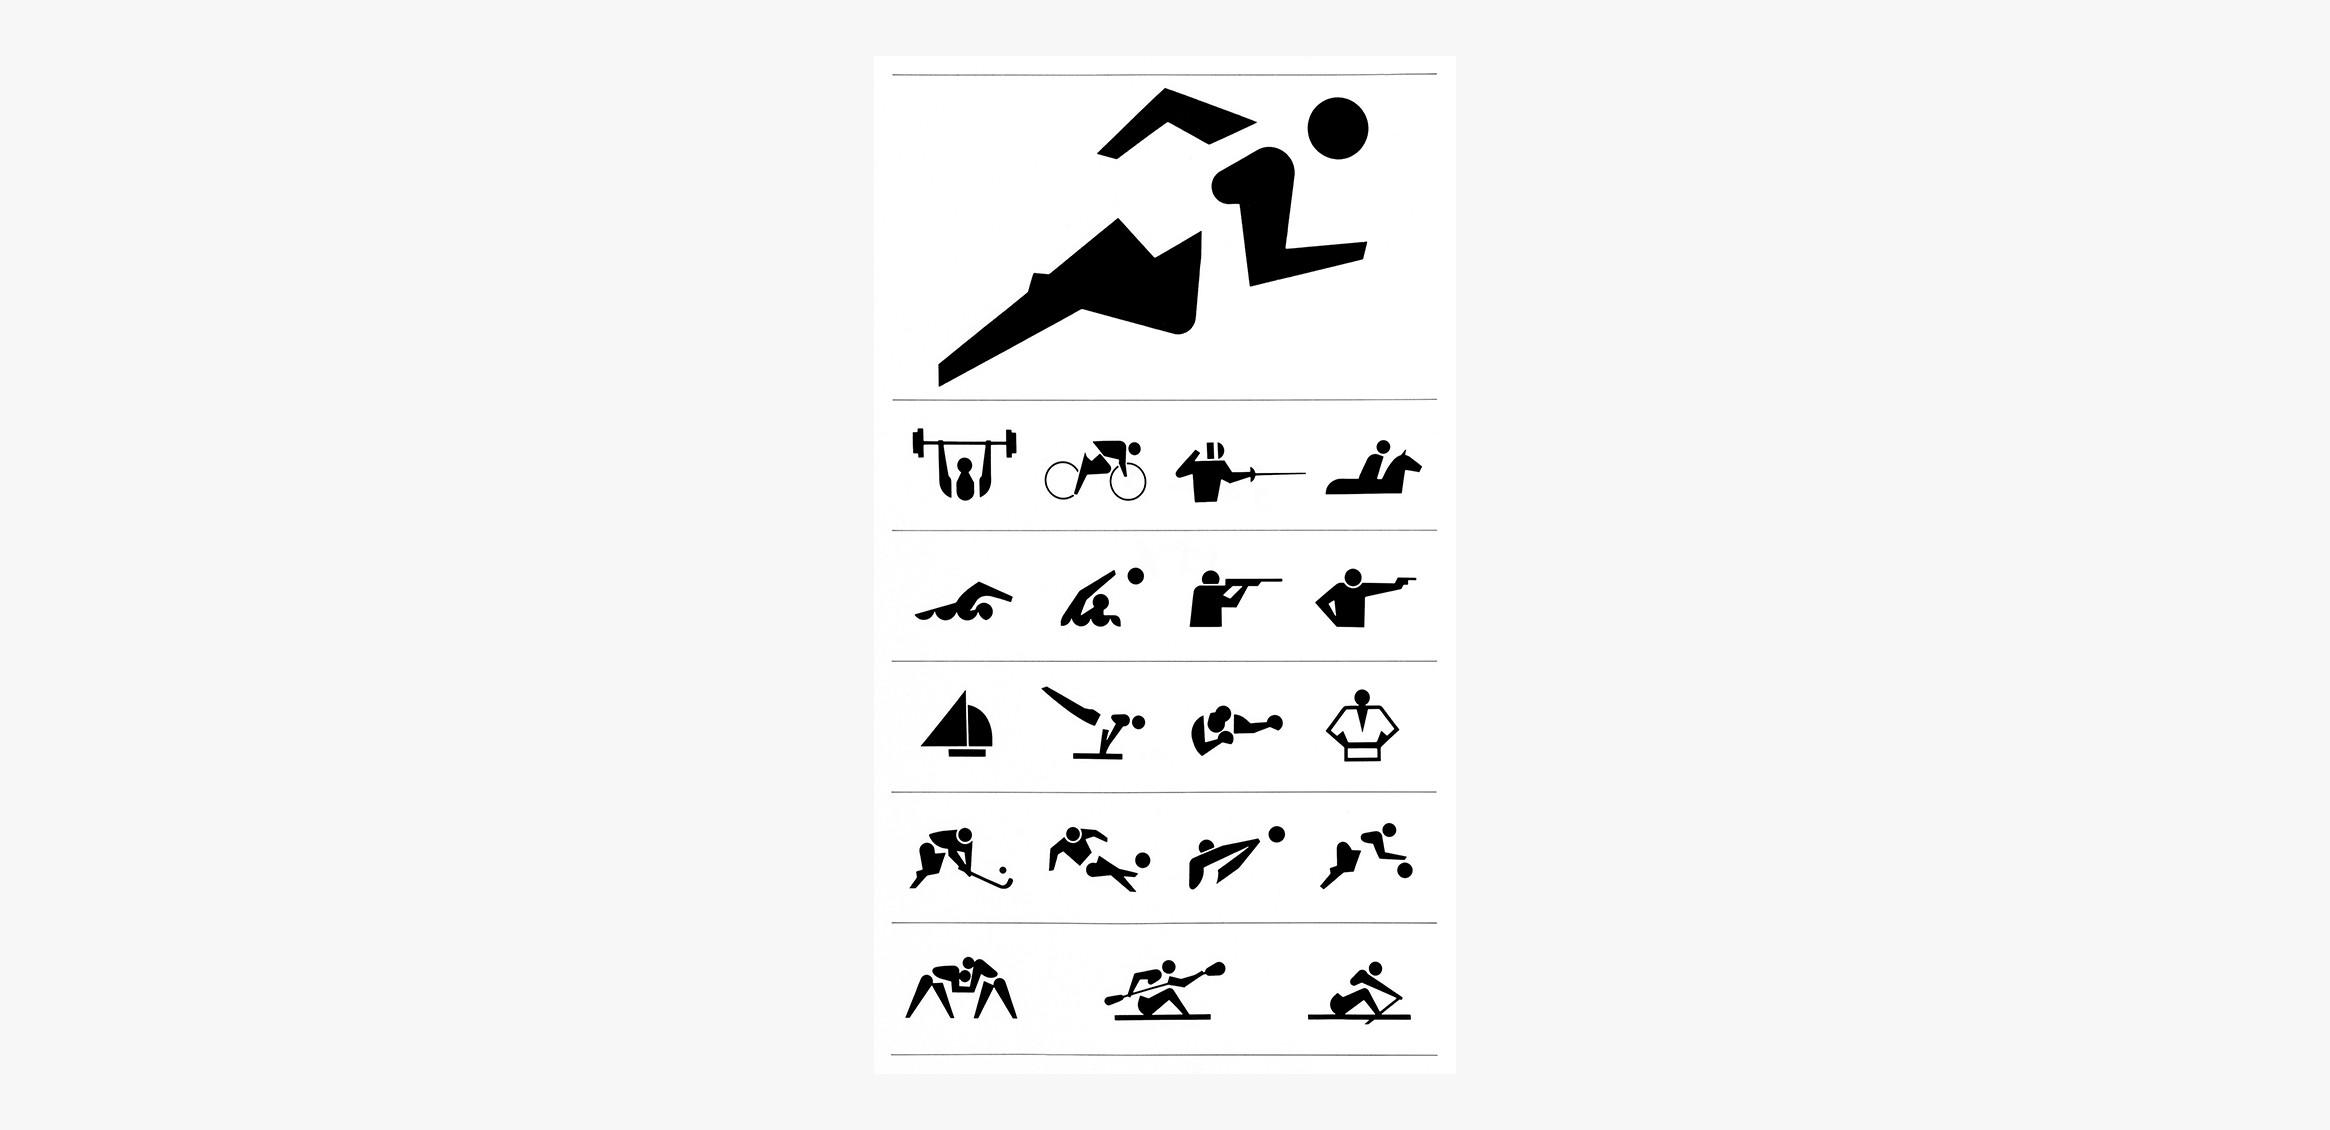 # Olympic Games 1964 Tokyo, Pictograms /  日本デザインセンター